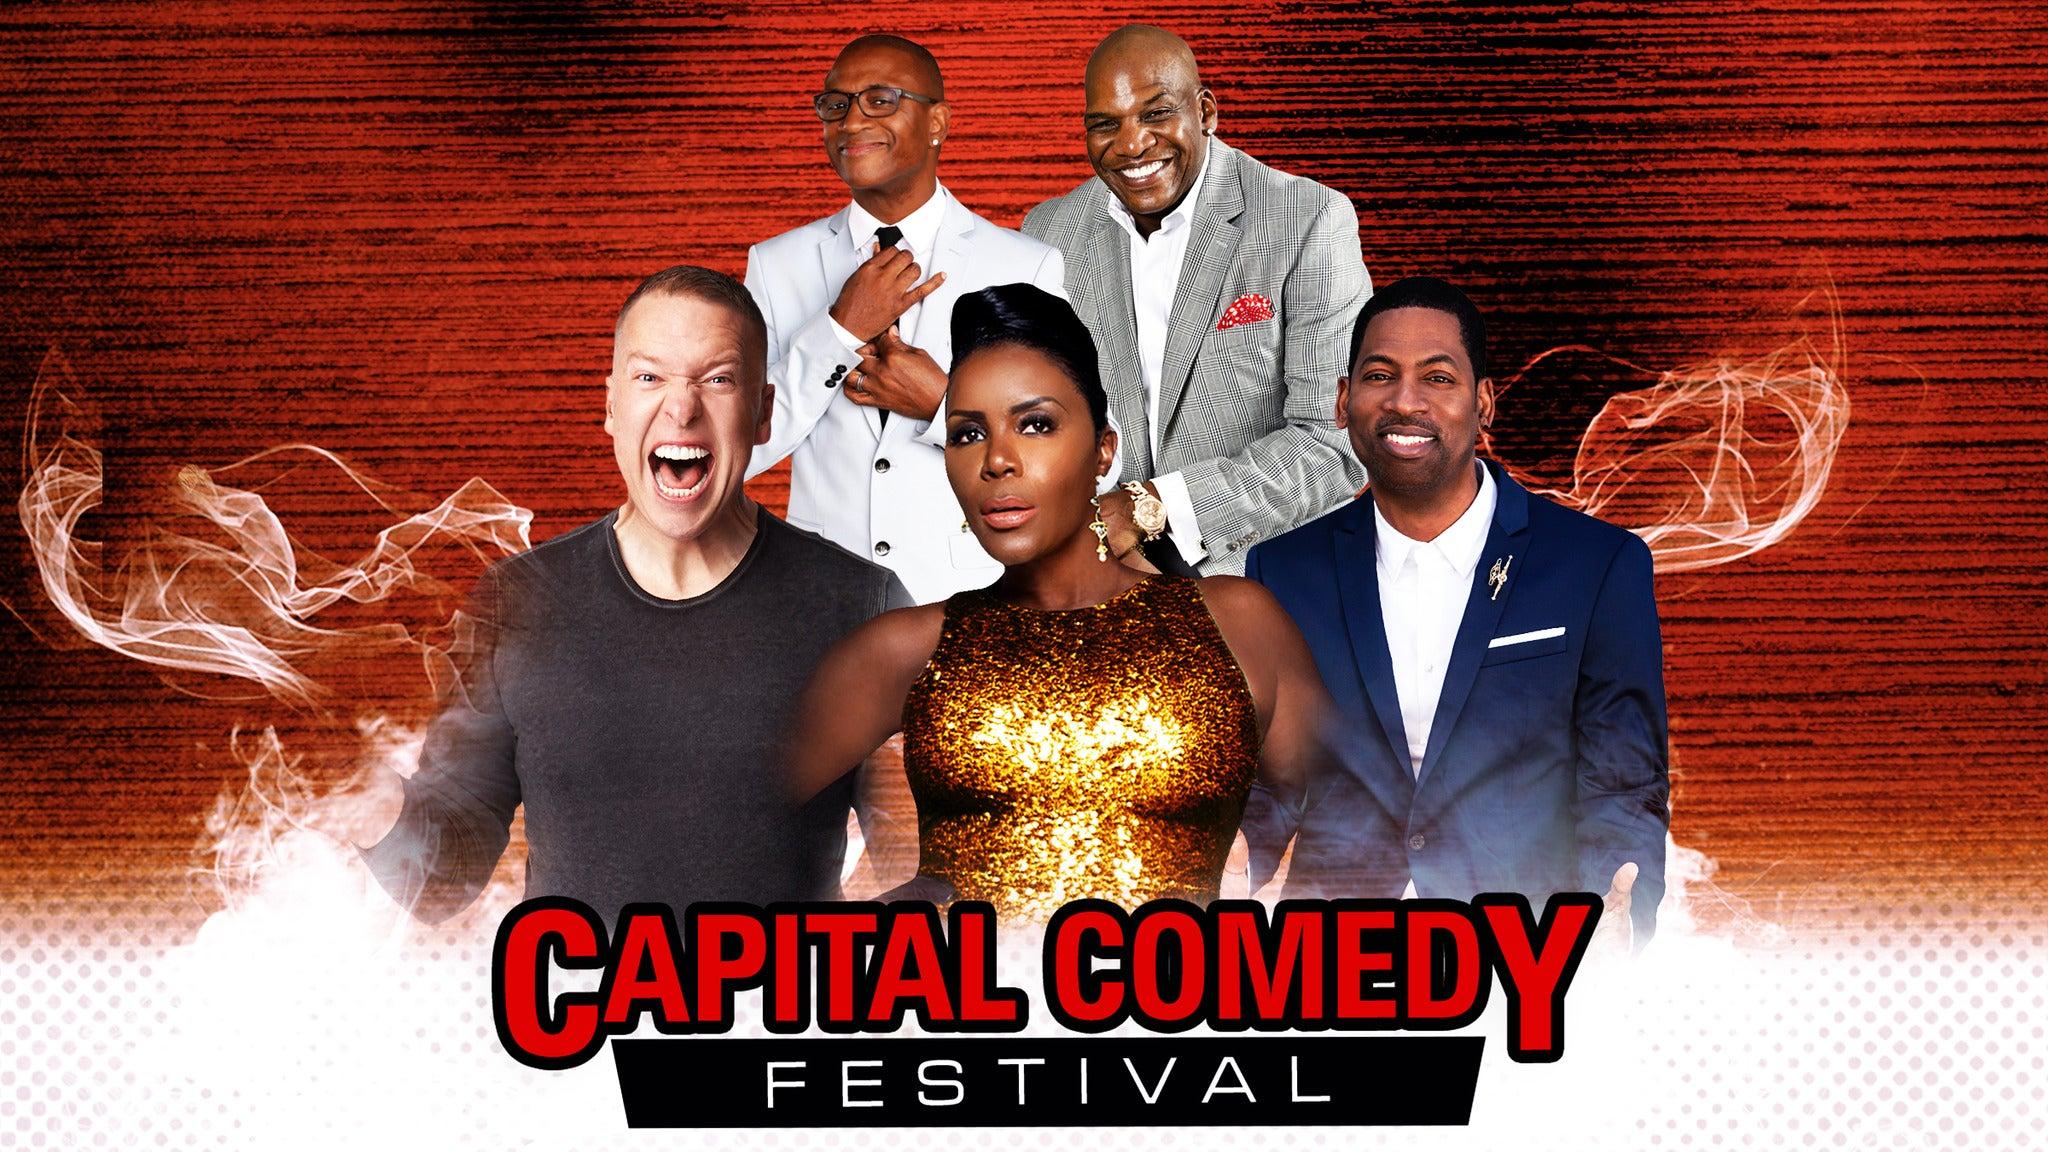 Capital Comedy Festival at DAR Constitution Hall - Washington, DC 20006